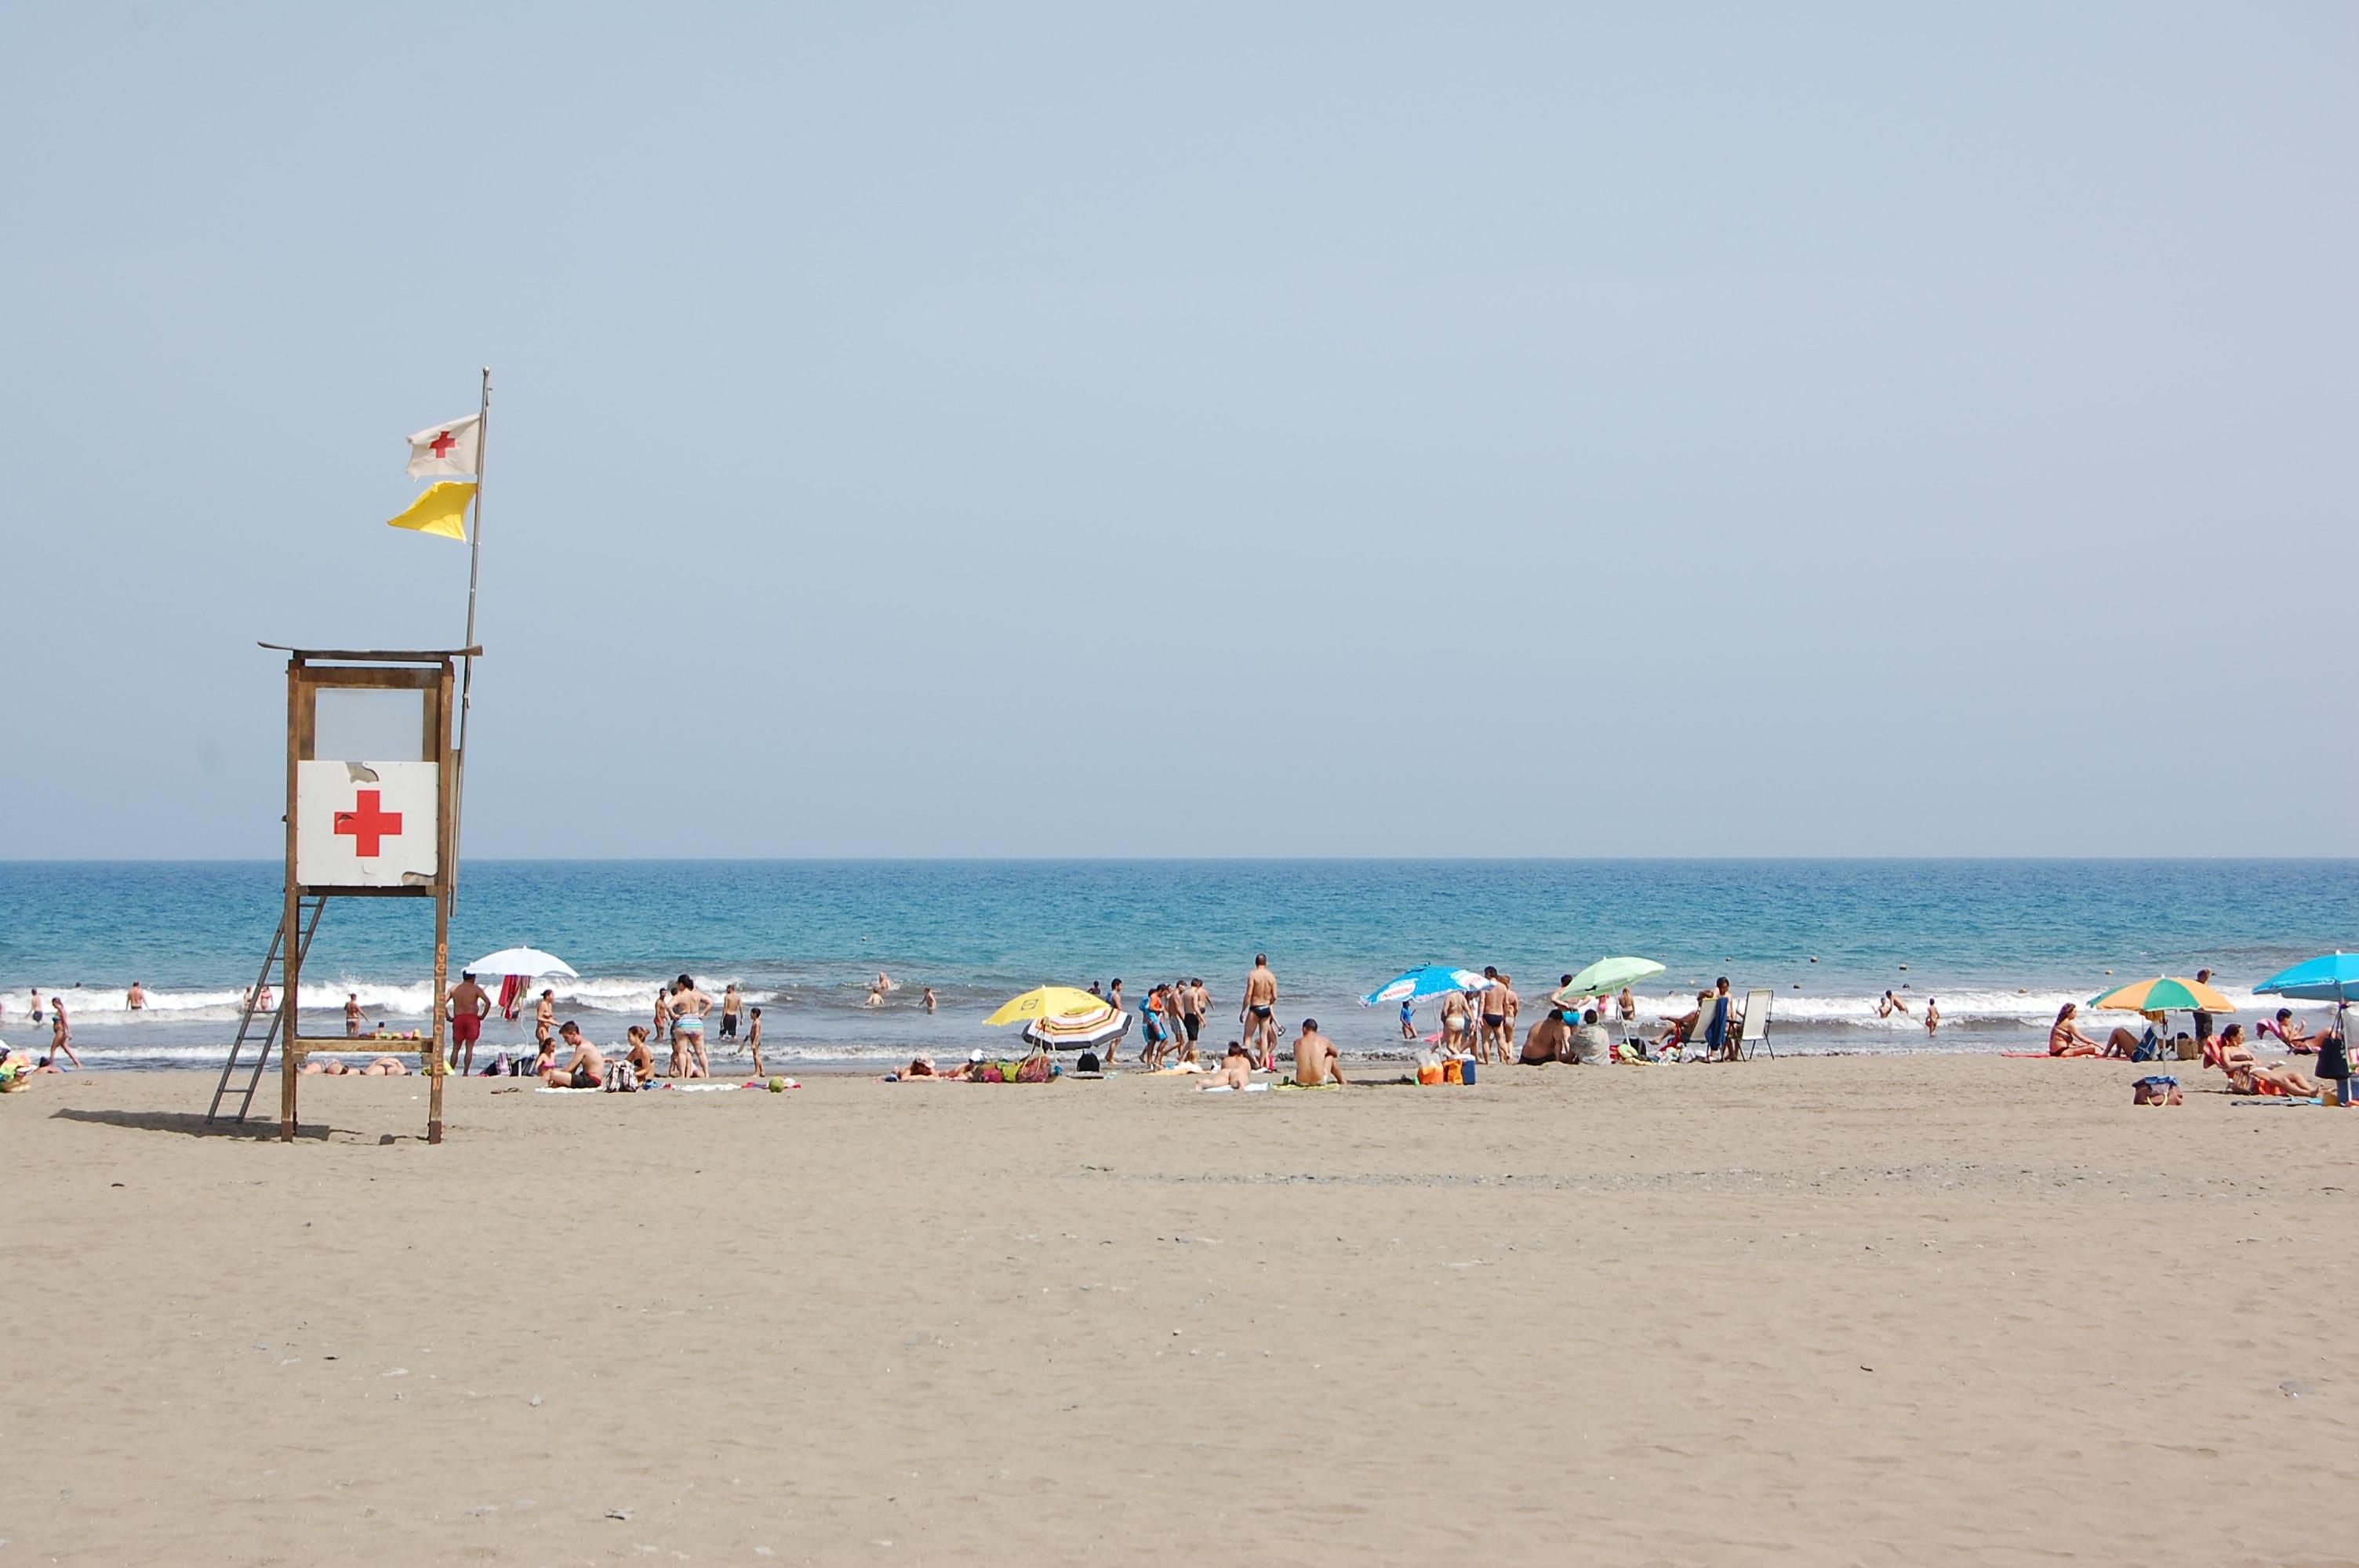 Lifeguard tower on crowdy sand beach in Gran Canaria